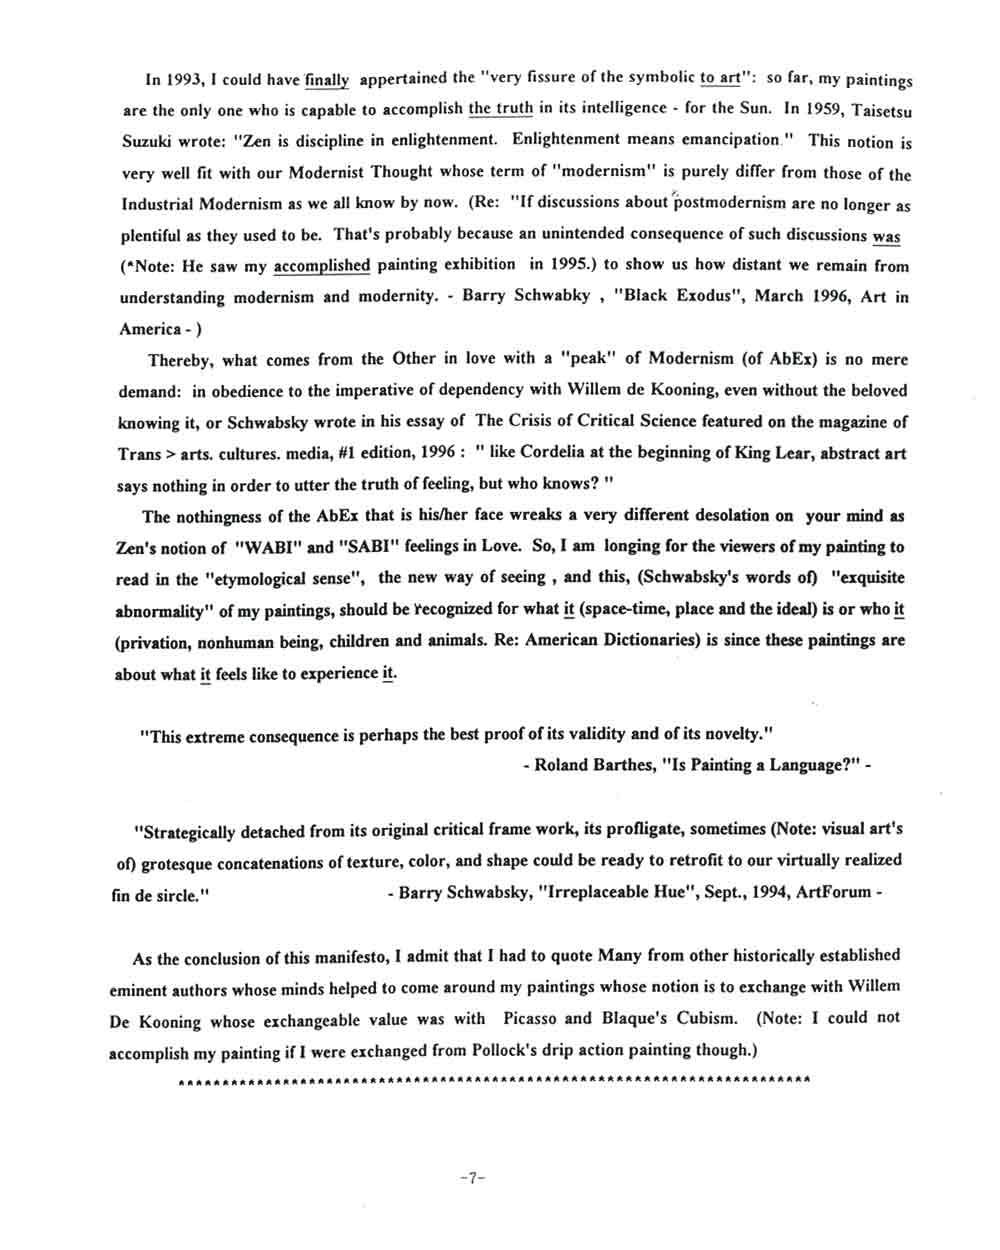 Rocky Kagoshima's Artist Statement, pg 7